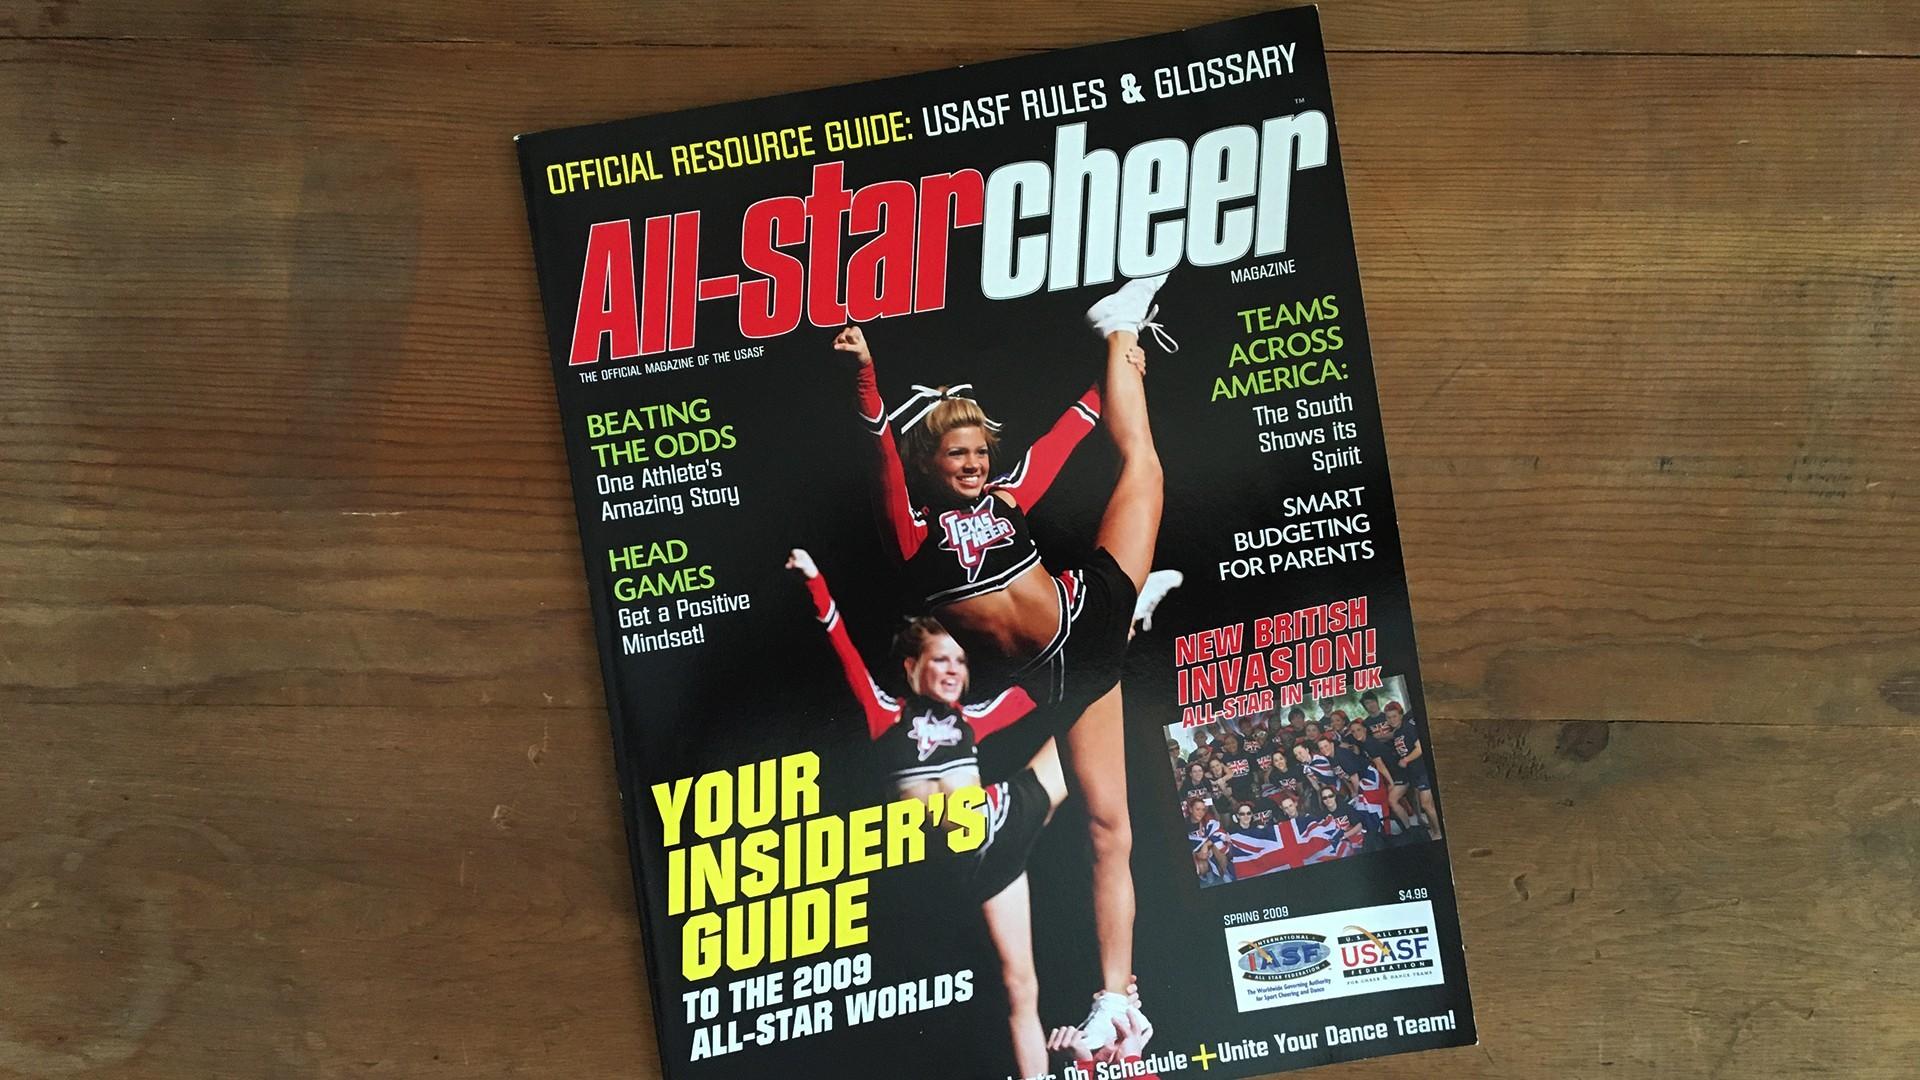 All-Star Cheer Magazine